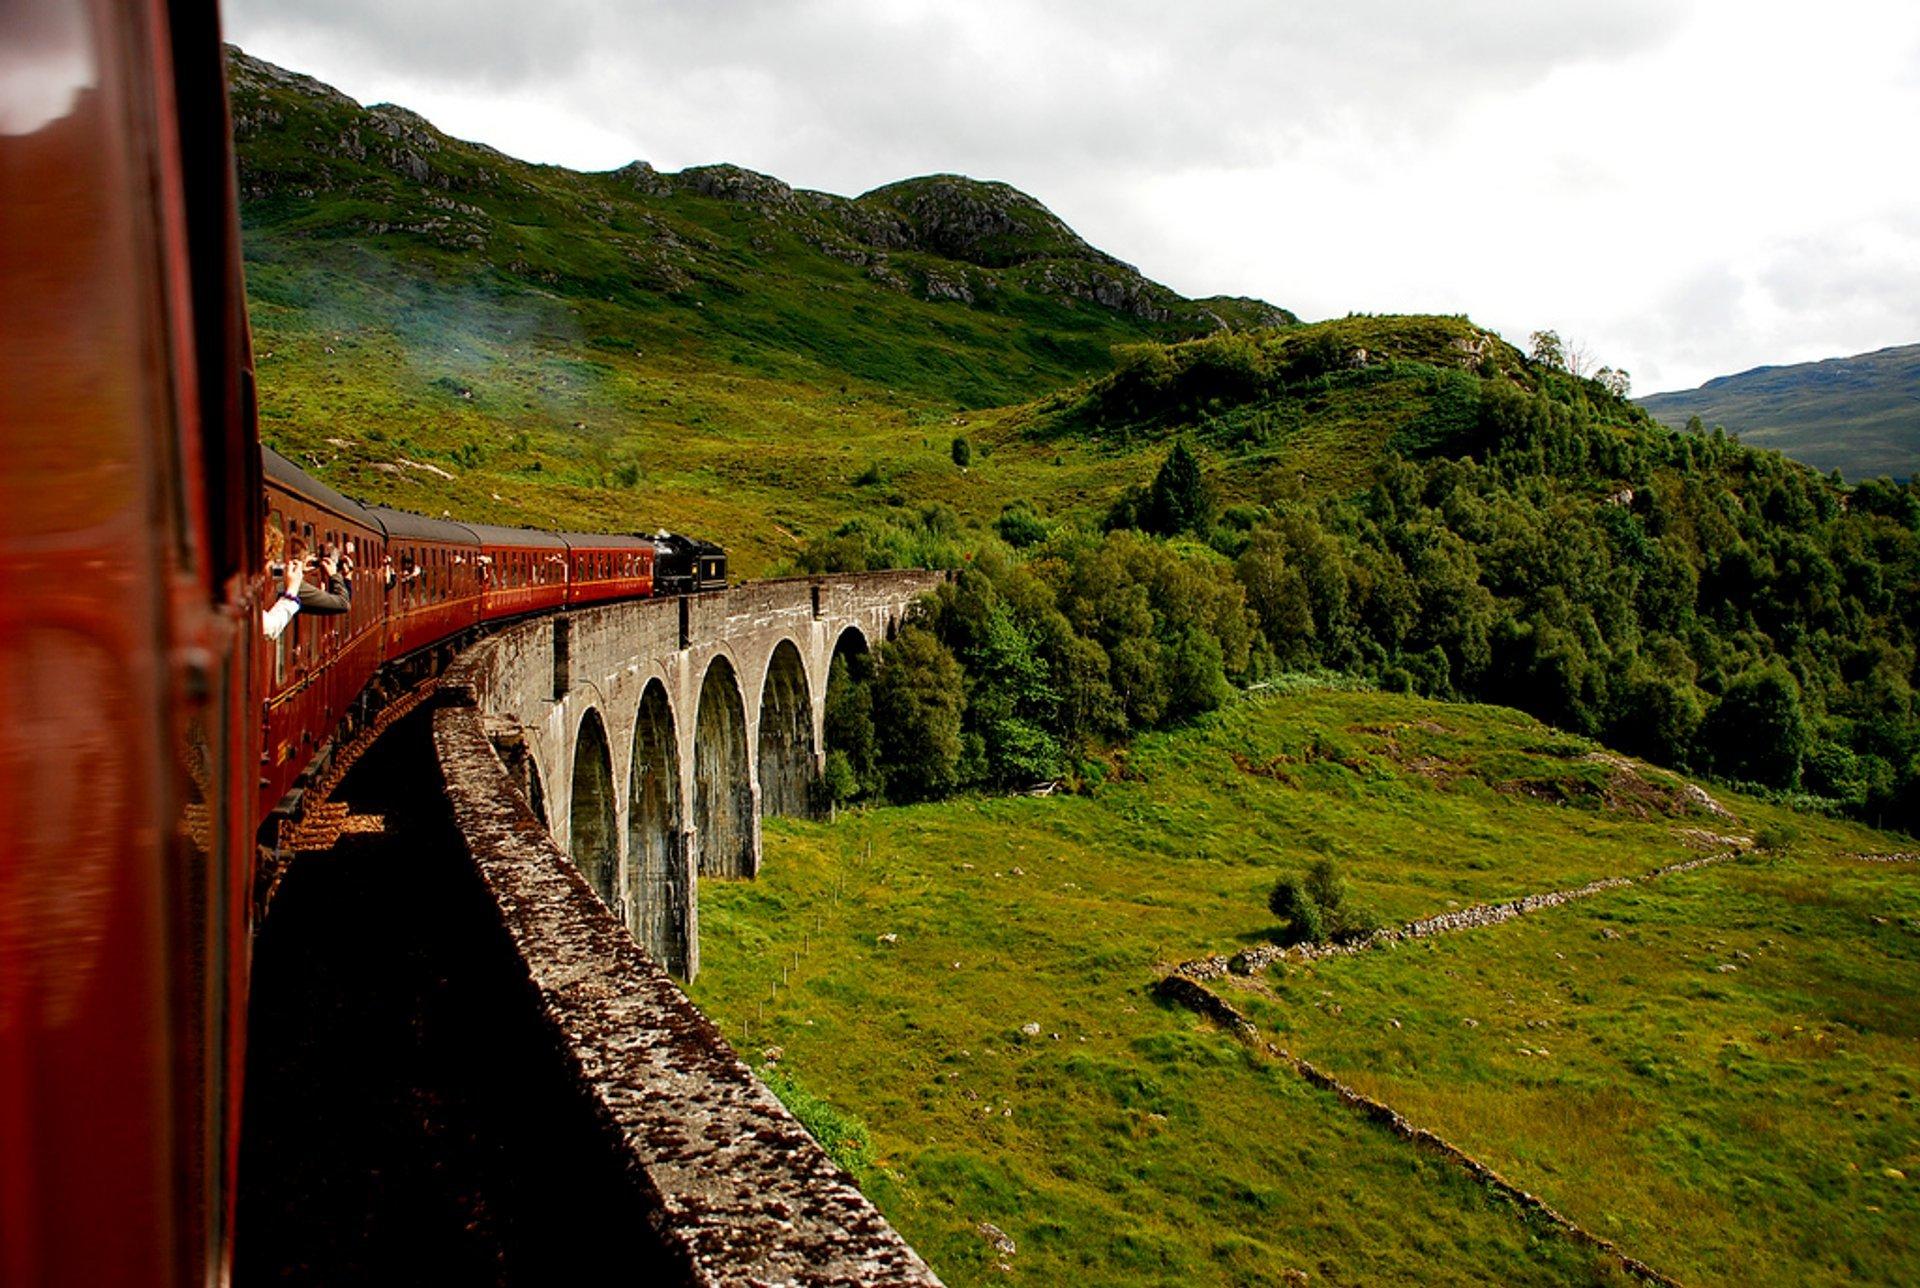 Glenfinnan Viaduct 2020